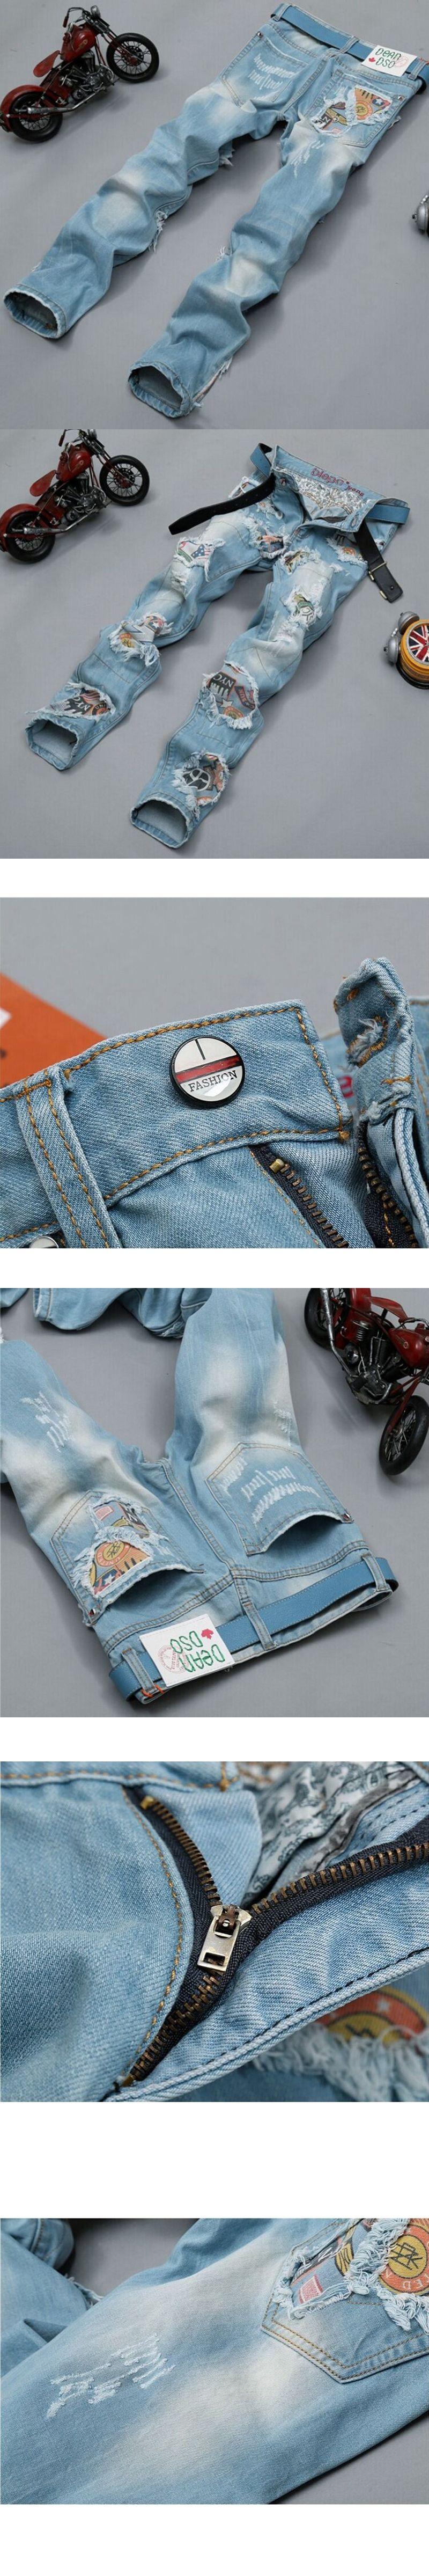 Biker jeans 2017 New Designer Slim Jeans Men's High Quality hip hop Ripped Jeans pants Straight Hole Denim Jeans 30-38